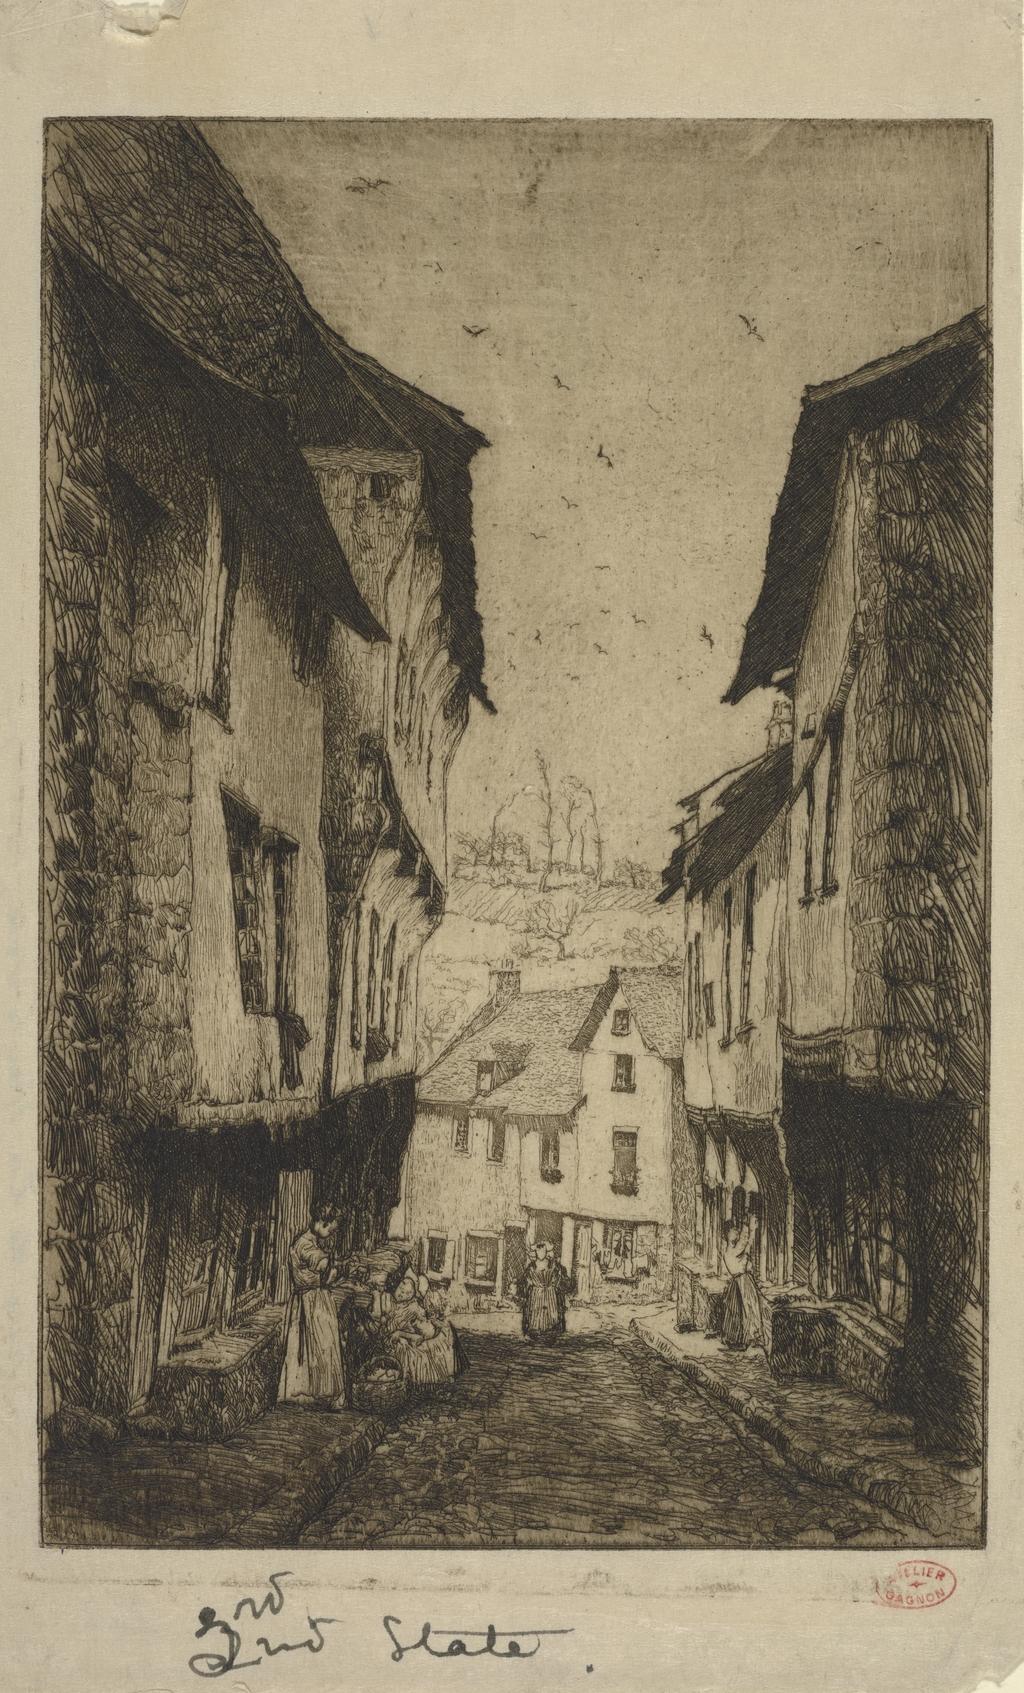 Rue de la Haute-Voie, Dinan